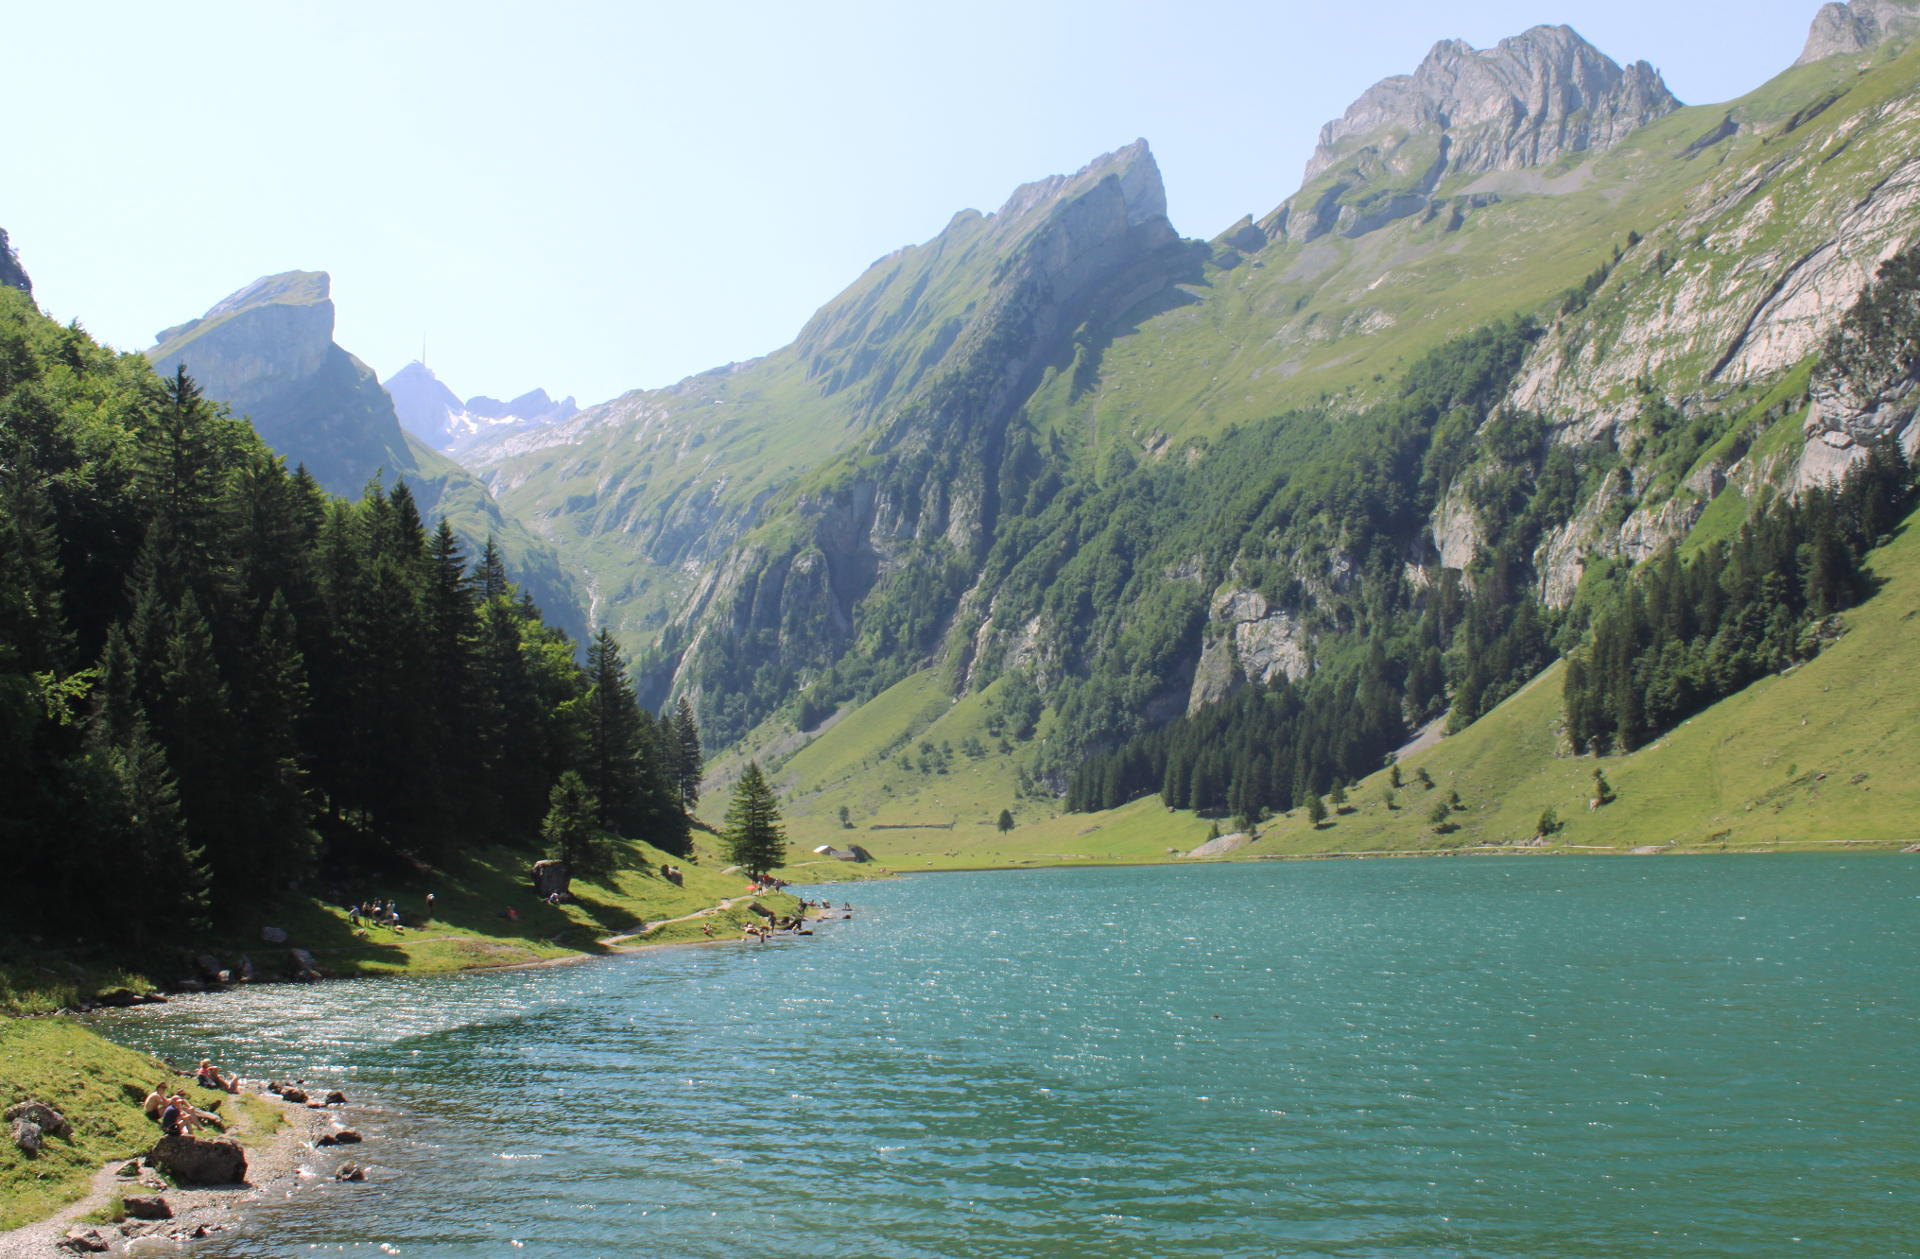 szwajcaria seealpsee jezioro natura iglawpodrozy